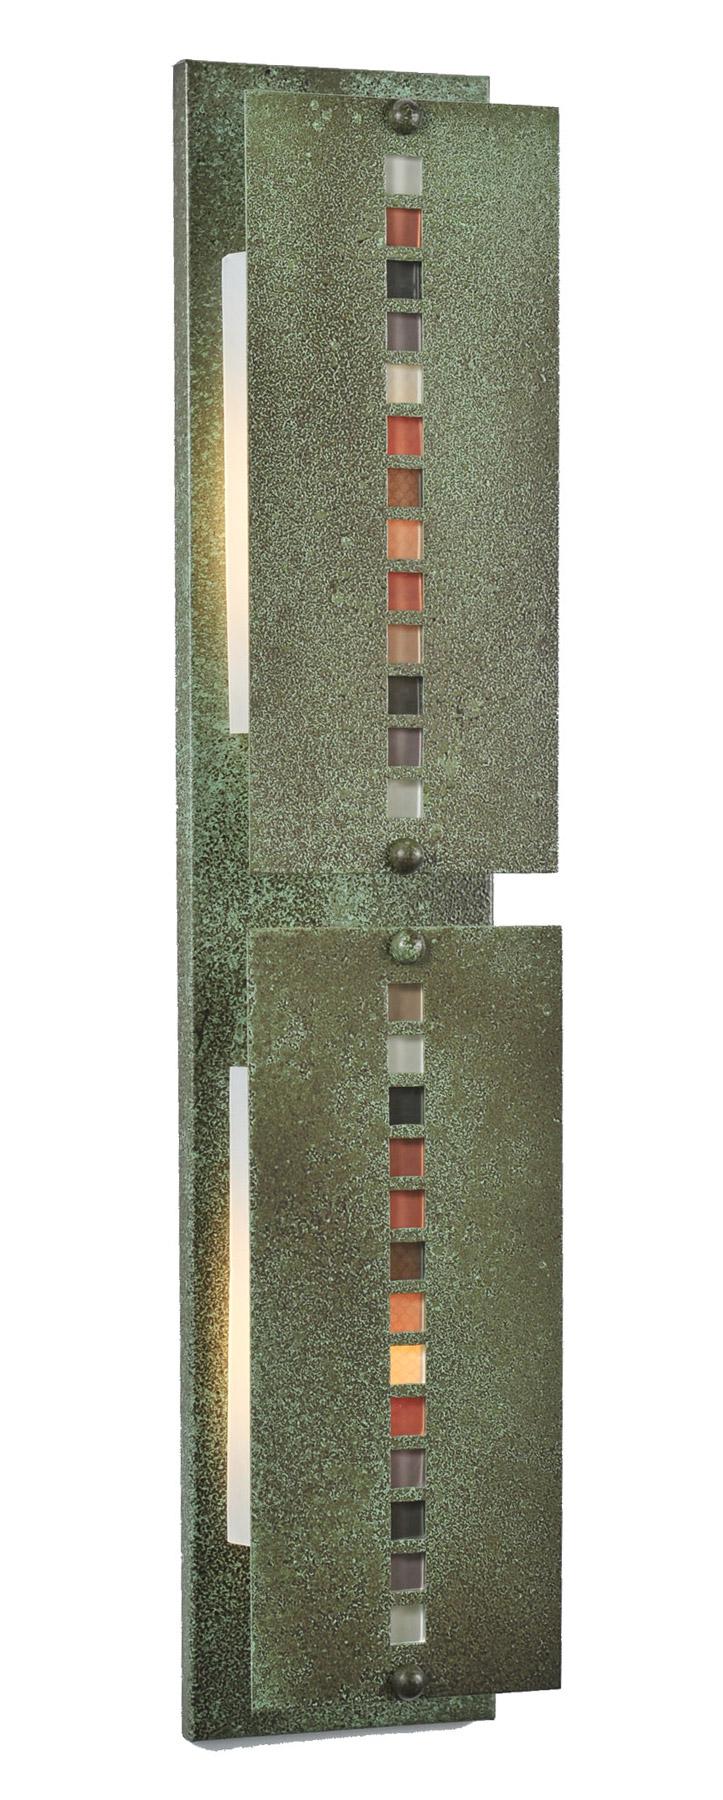 Vanity Lights Stone : Meyda 99389 Moss Creek Stepping Stone Vanity Light